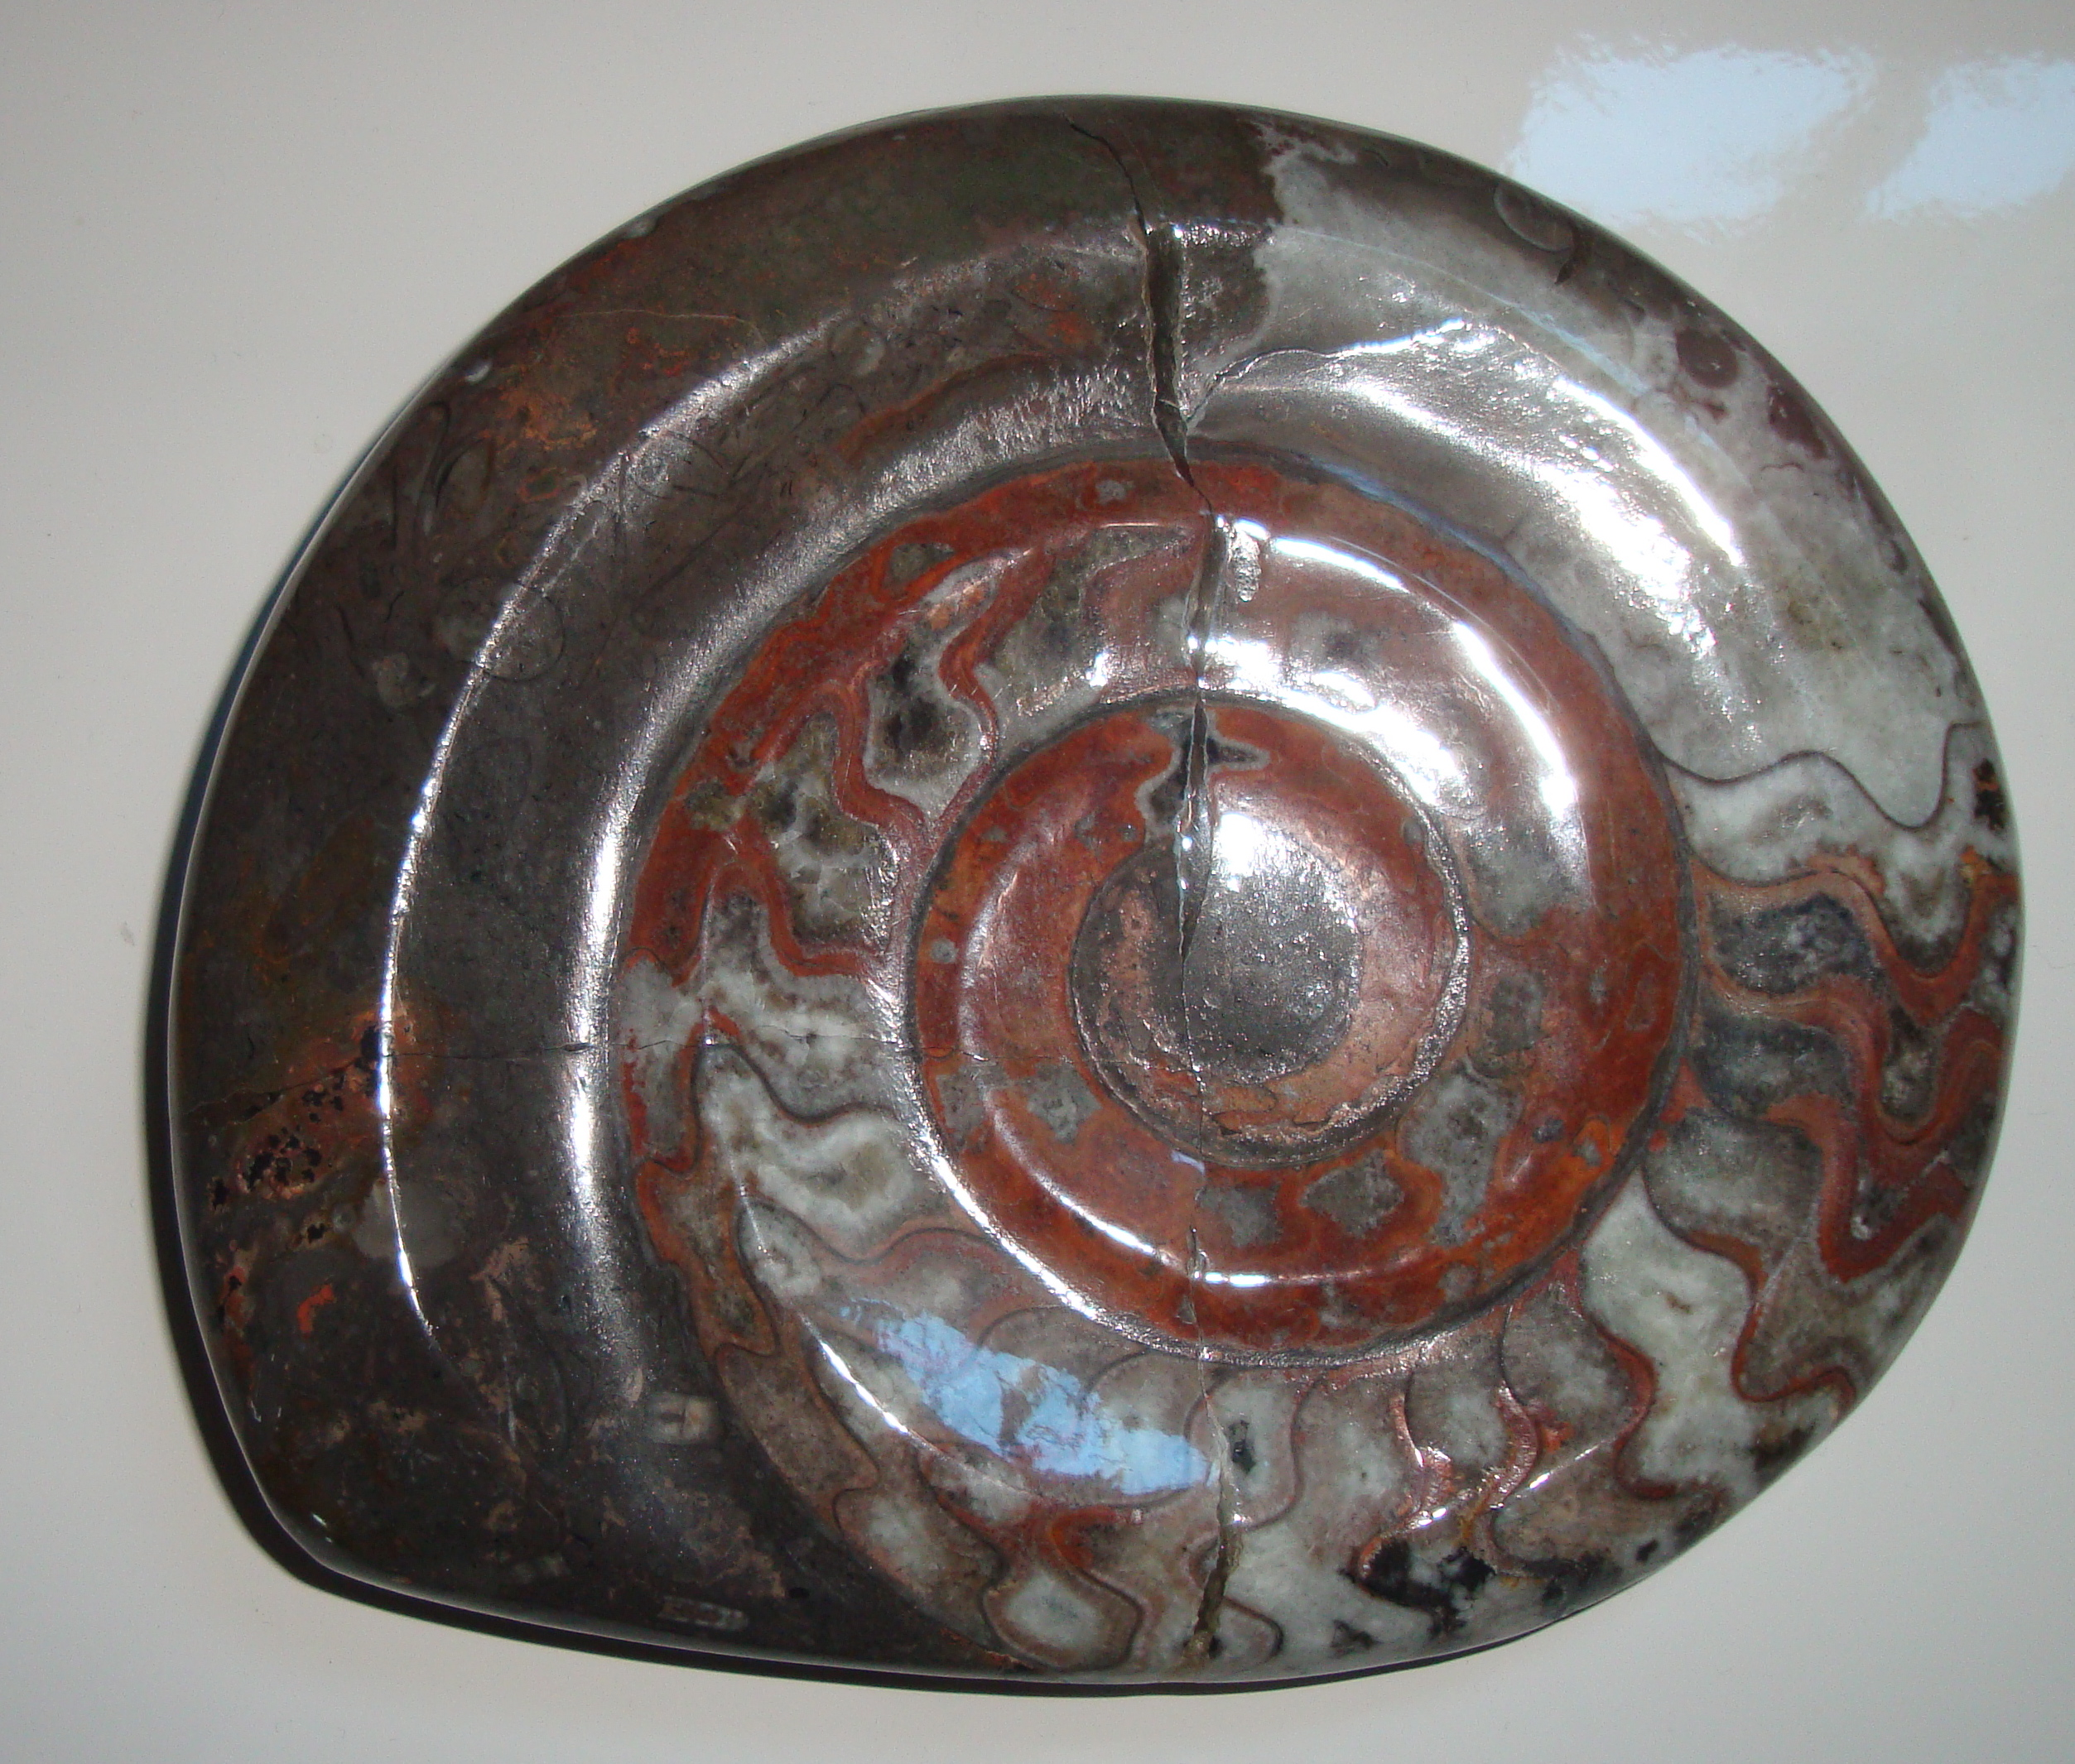 Fossile du Maroc